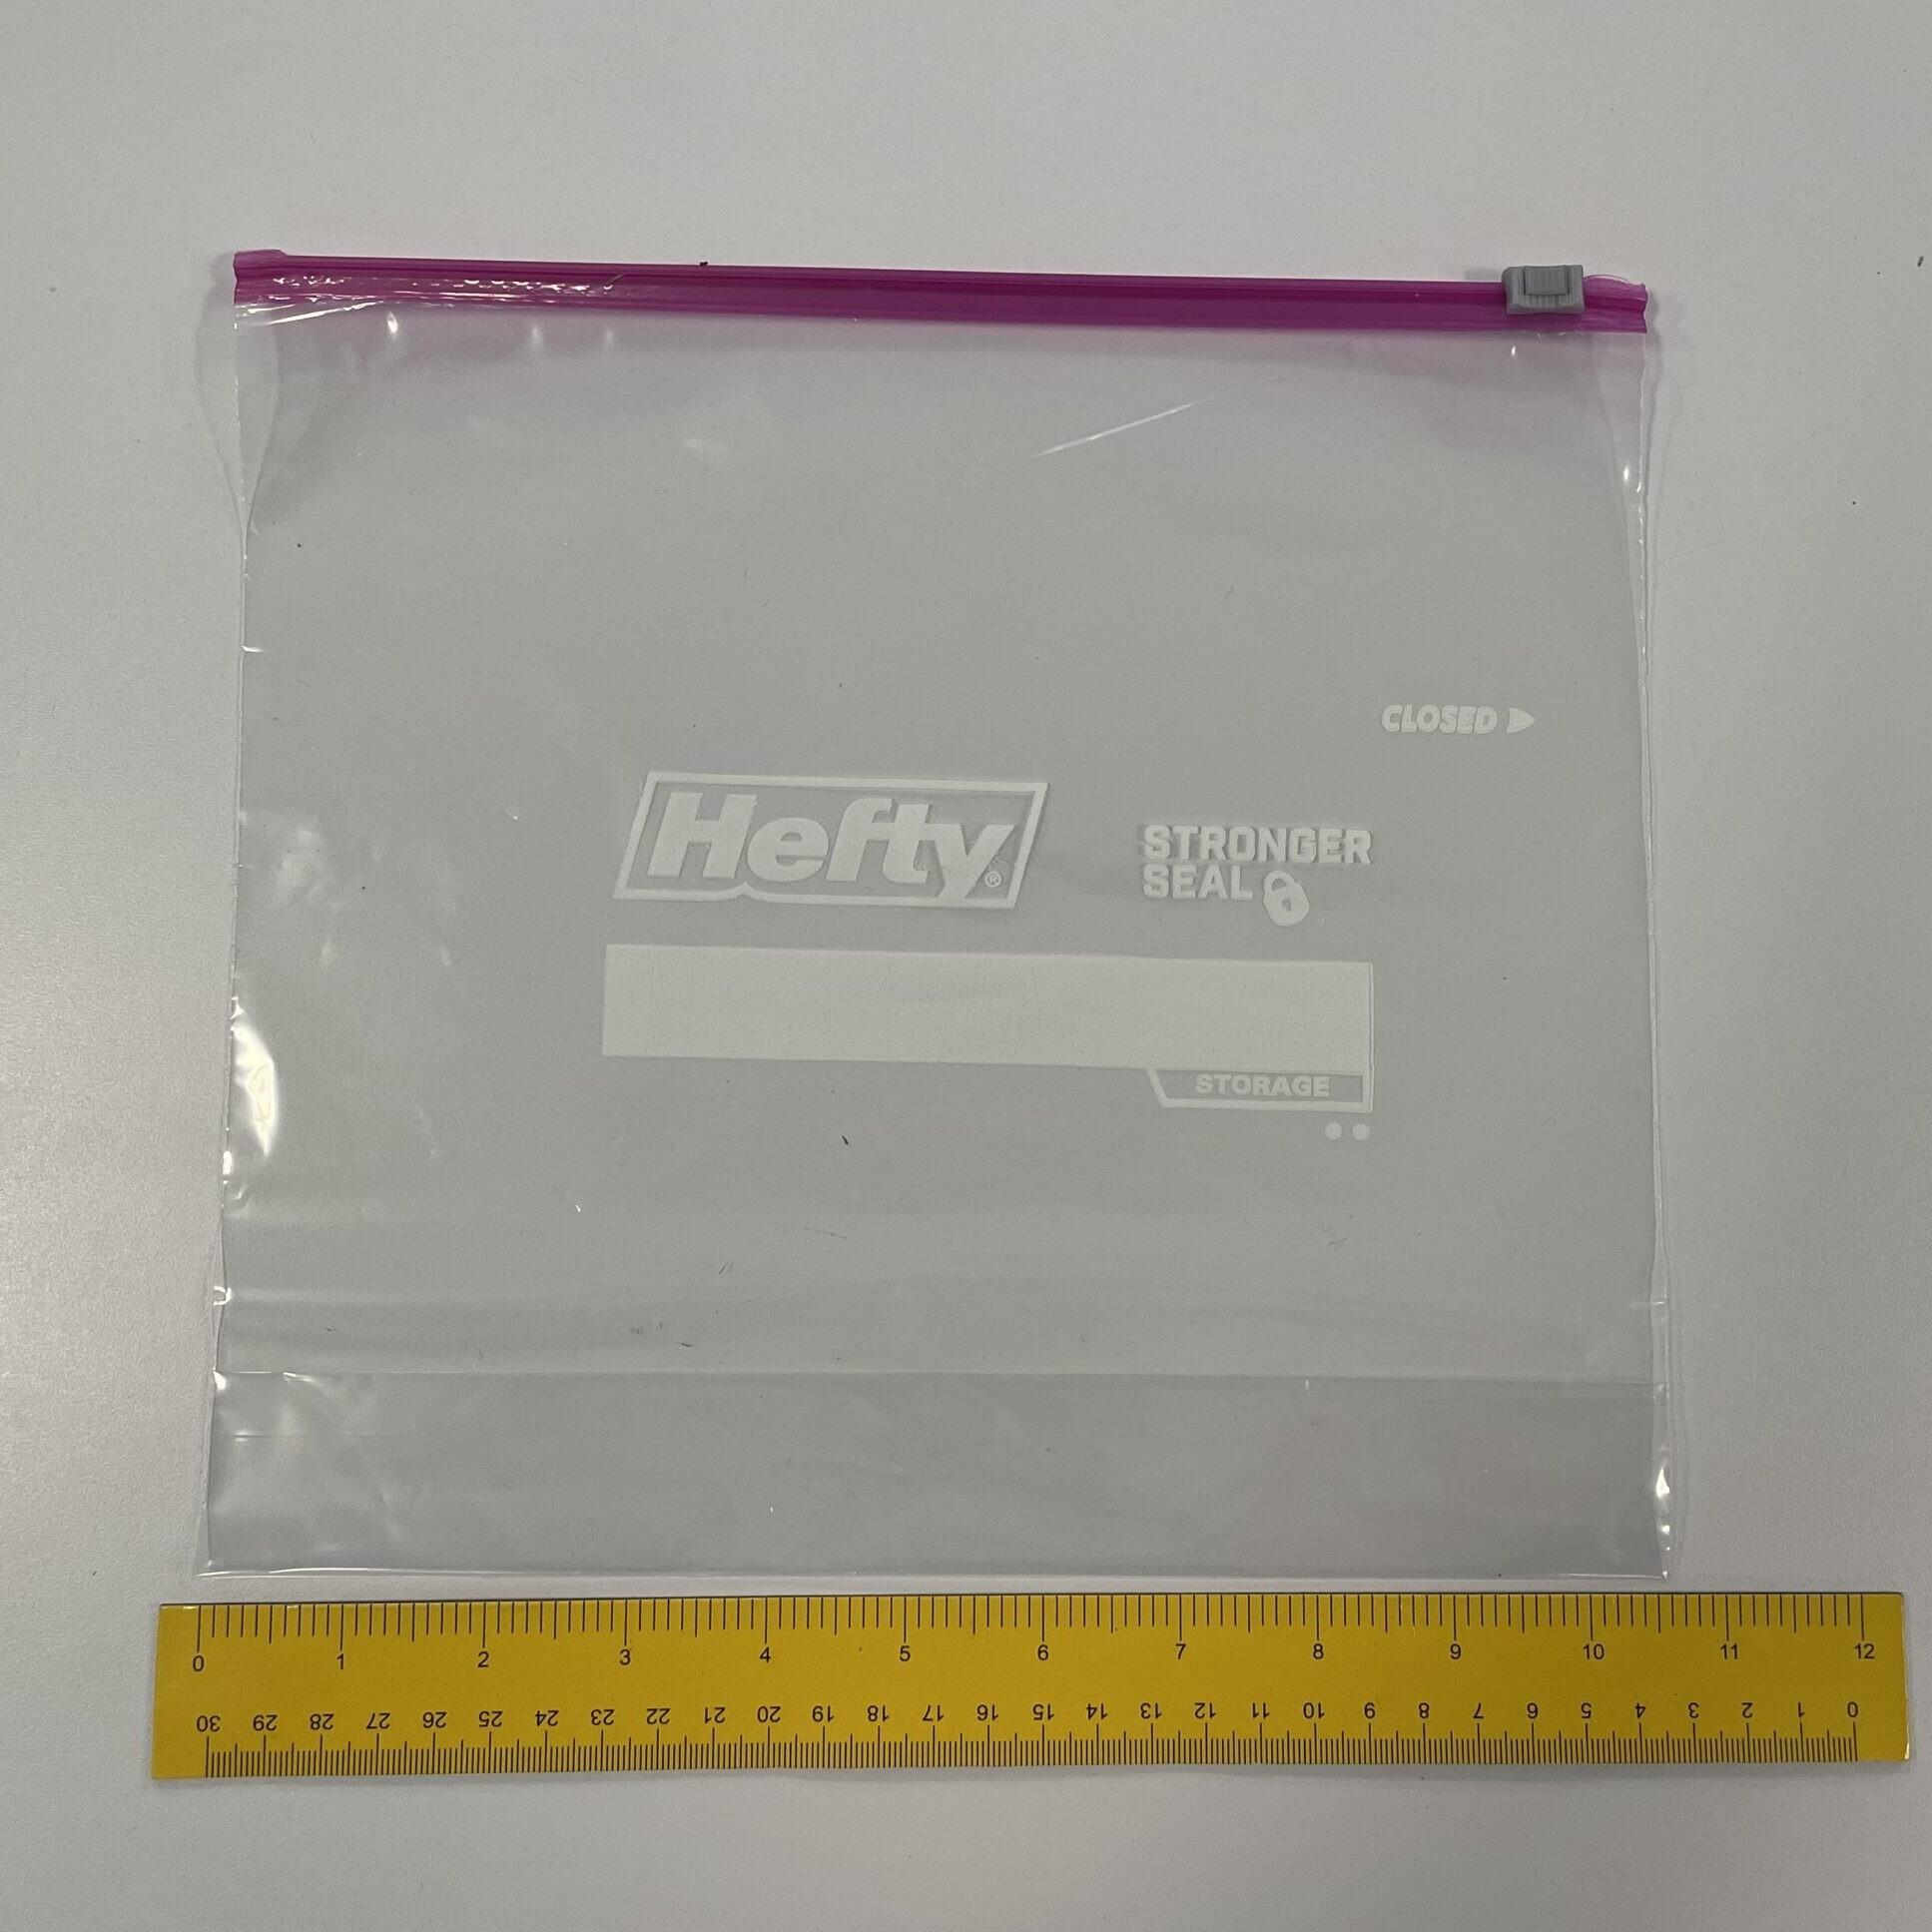 A hefty bag being measured